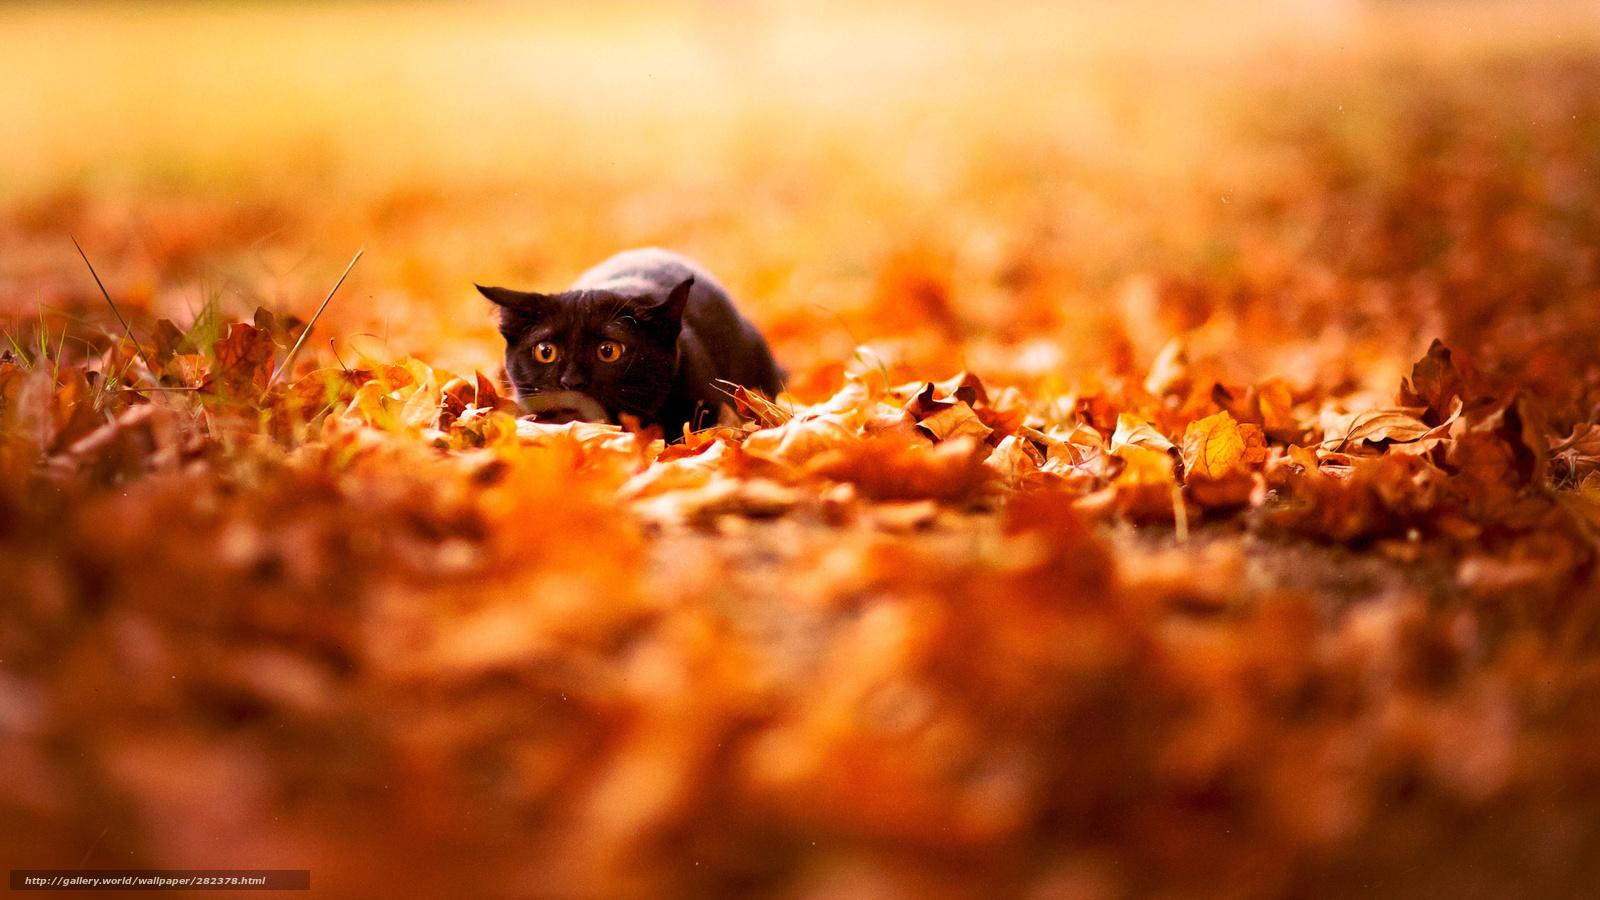 Hq sonbahar yapraklar doğa siyah kedi arka plan duvar kağıdı